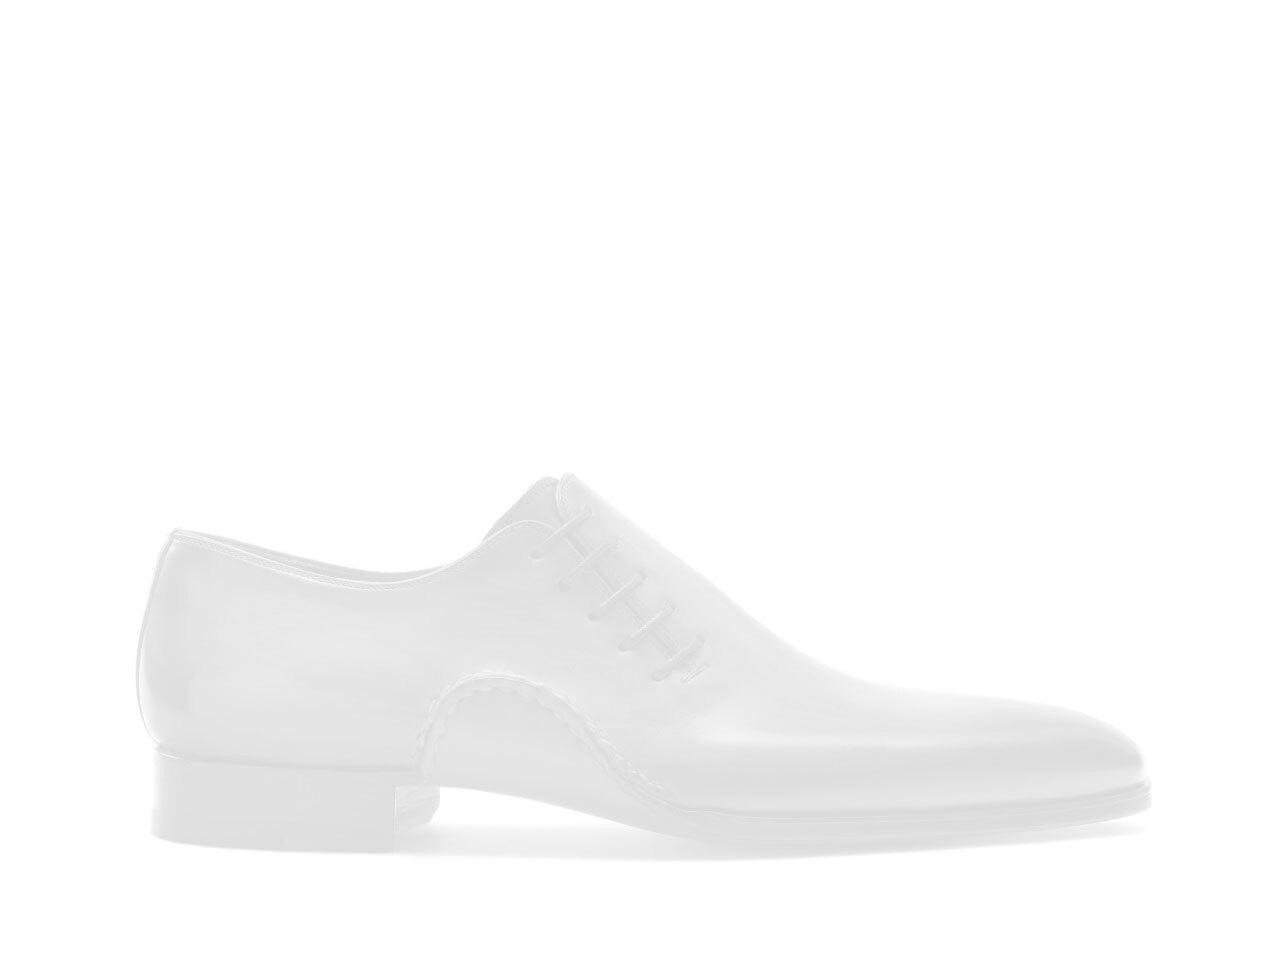 Sole of the Magnanni Mancera Brown Suede Men's Derby Shoes